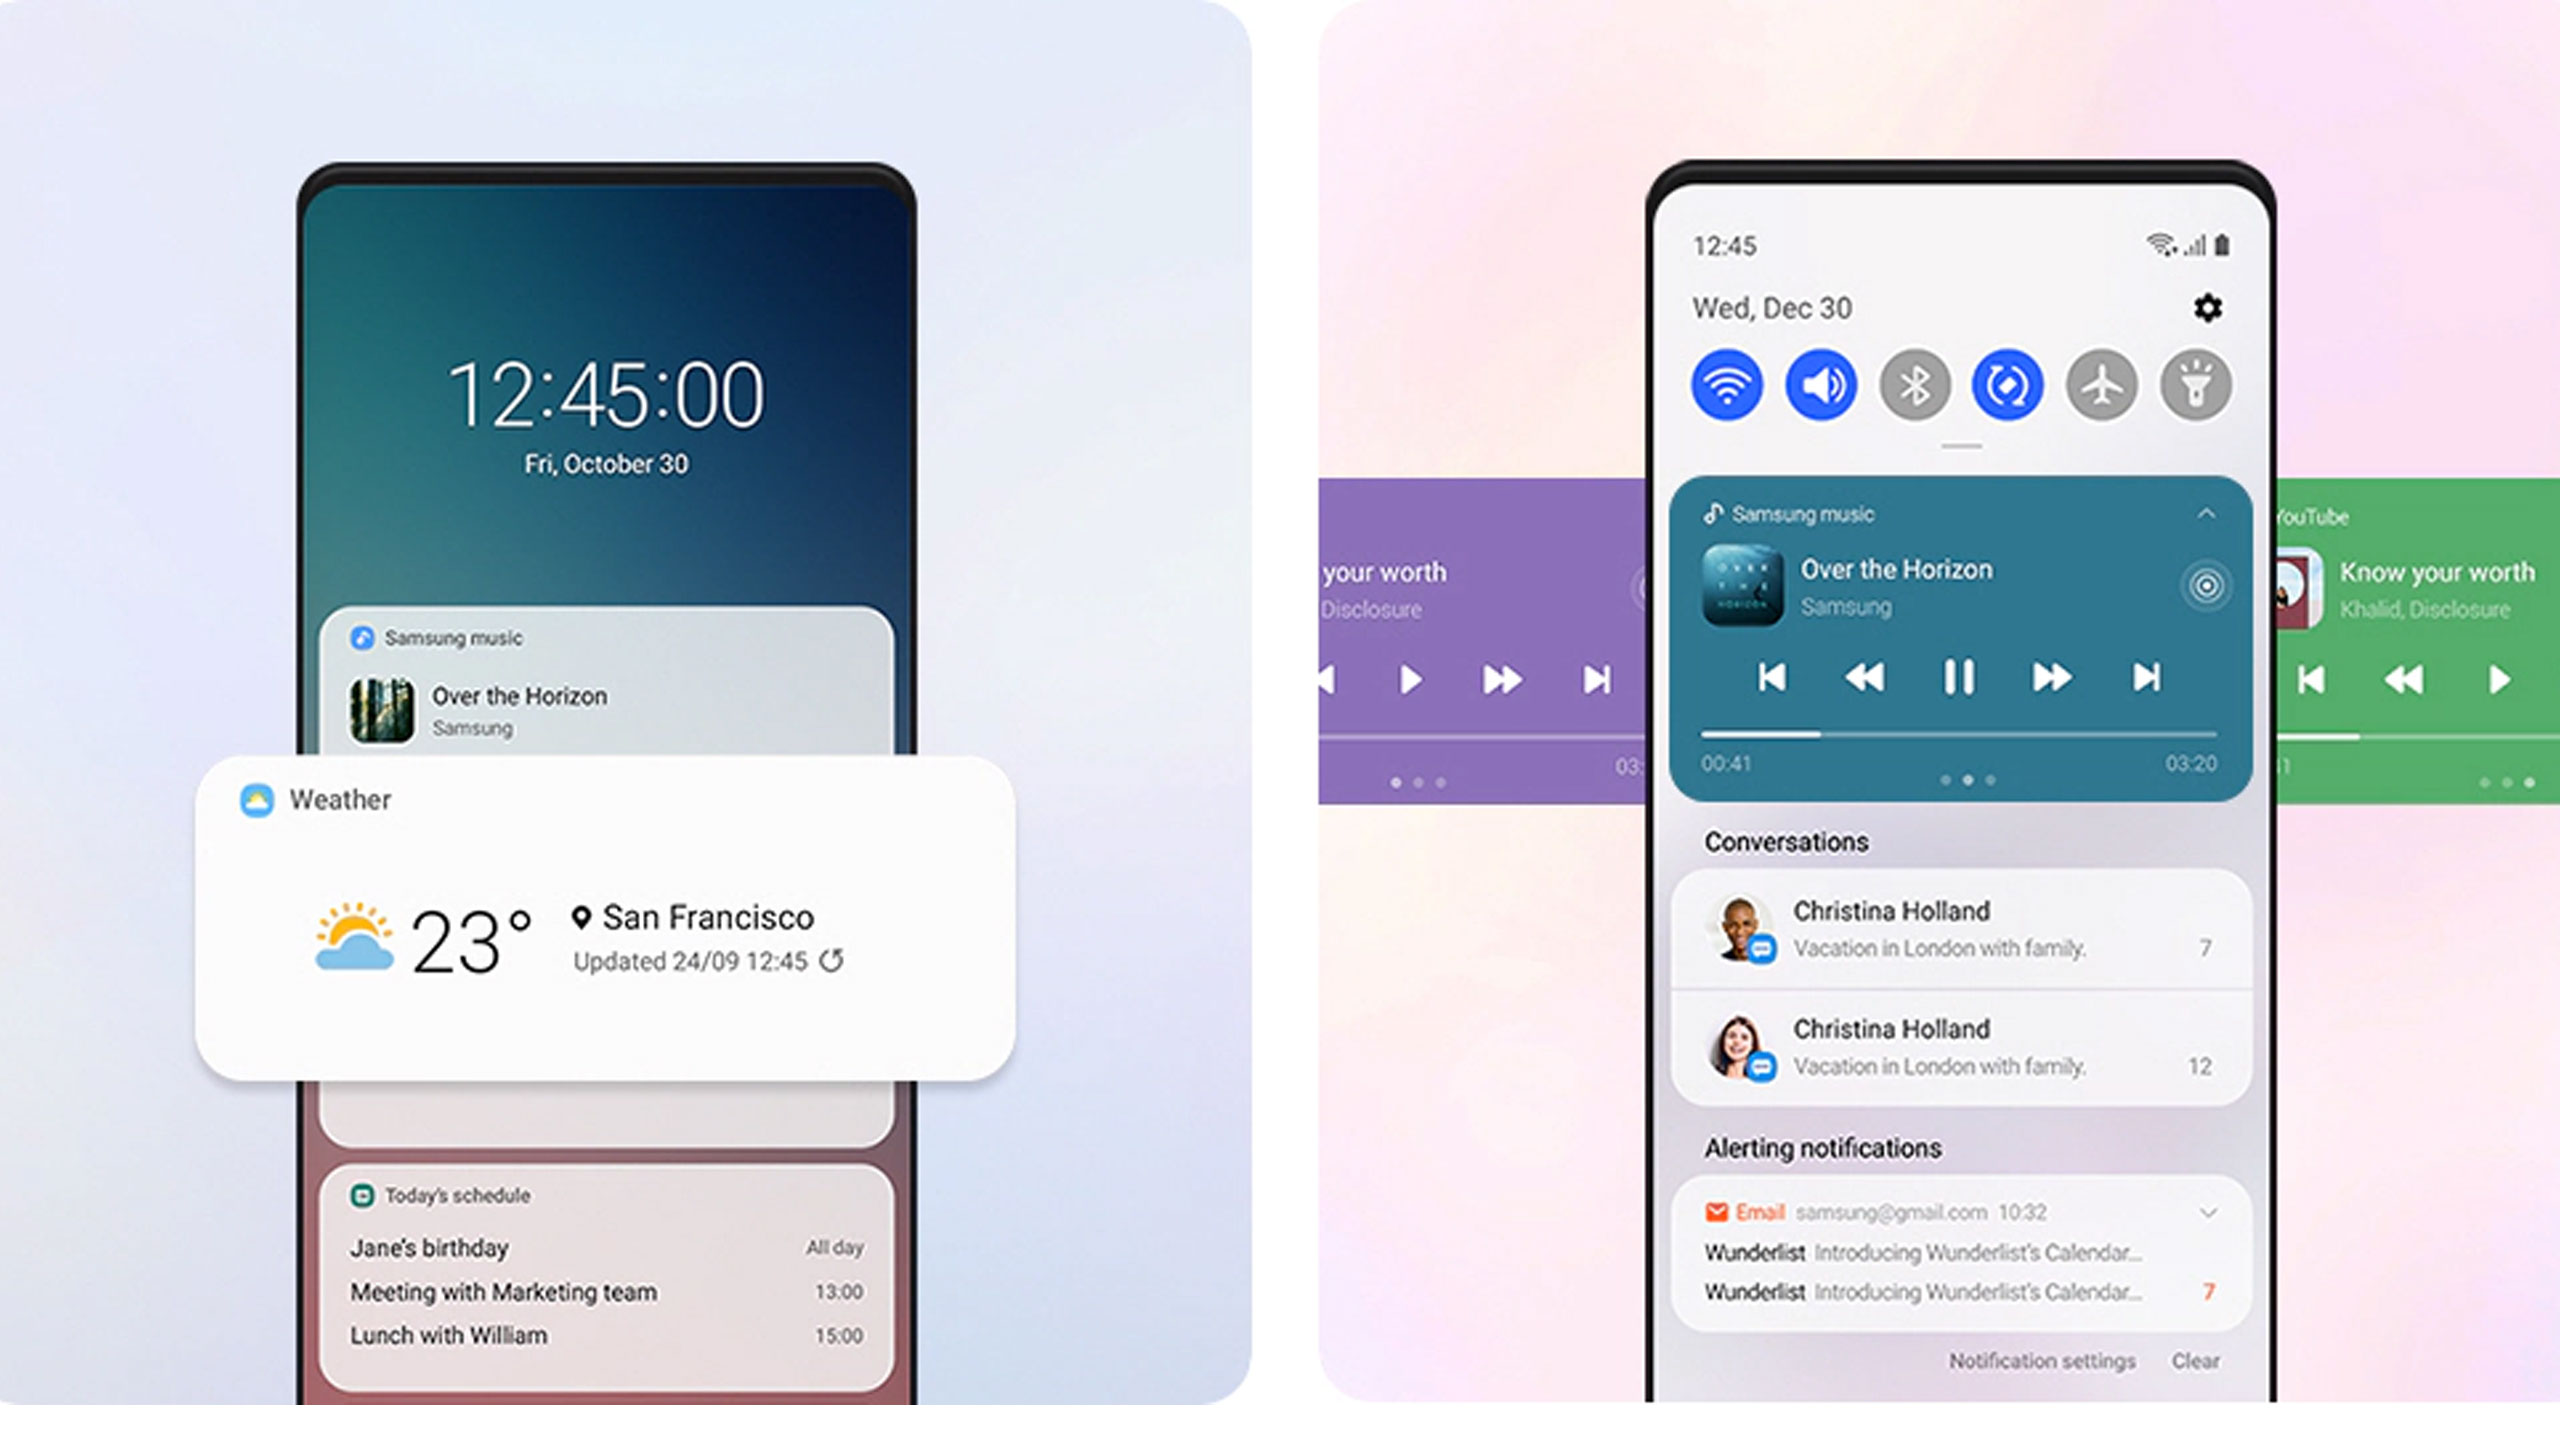 Samsung OneUI 3.0